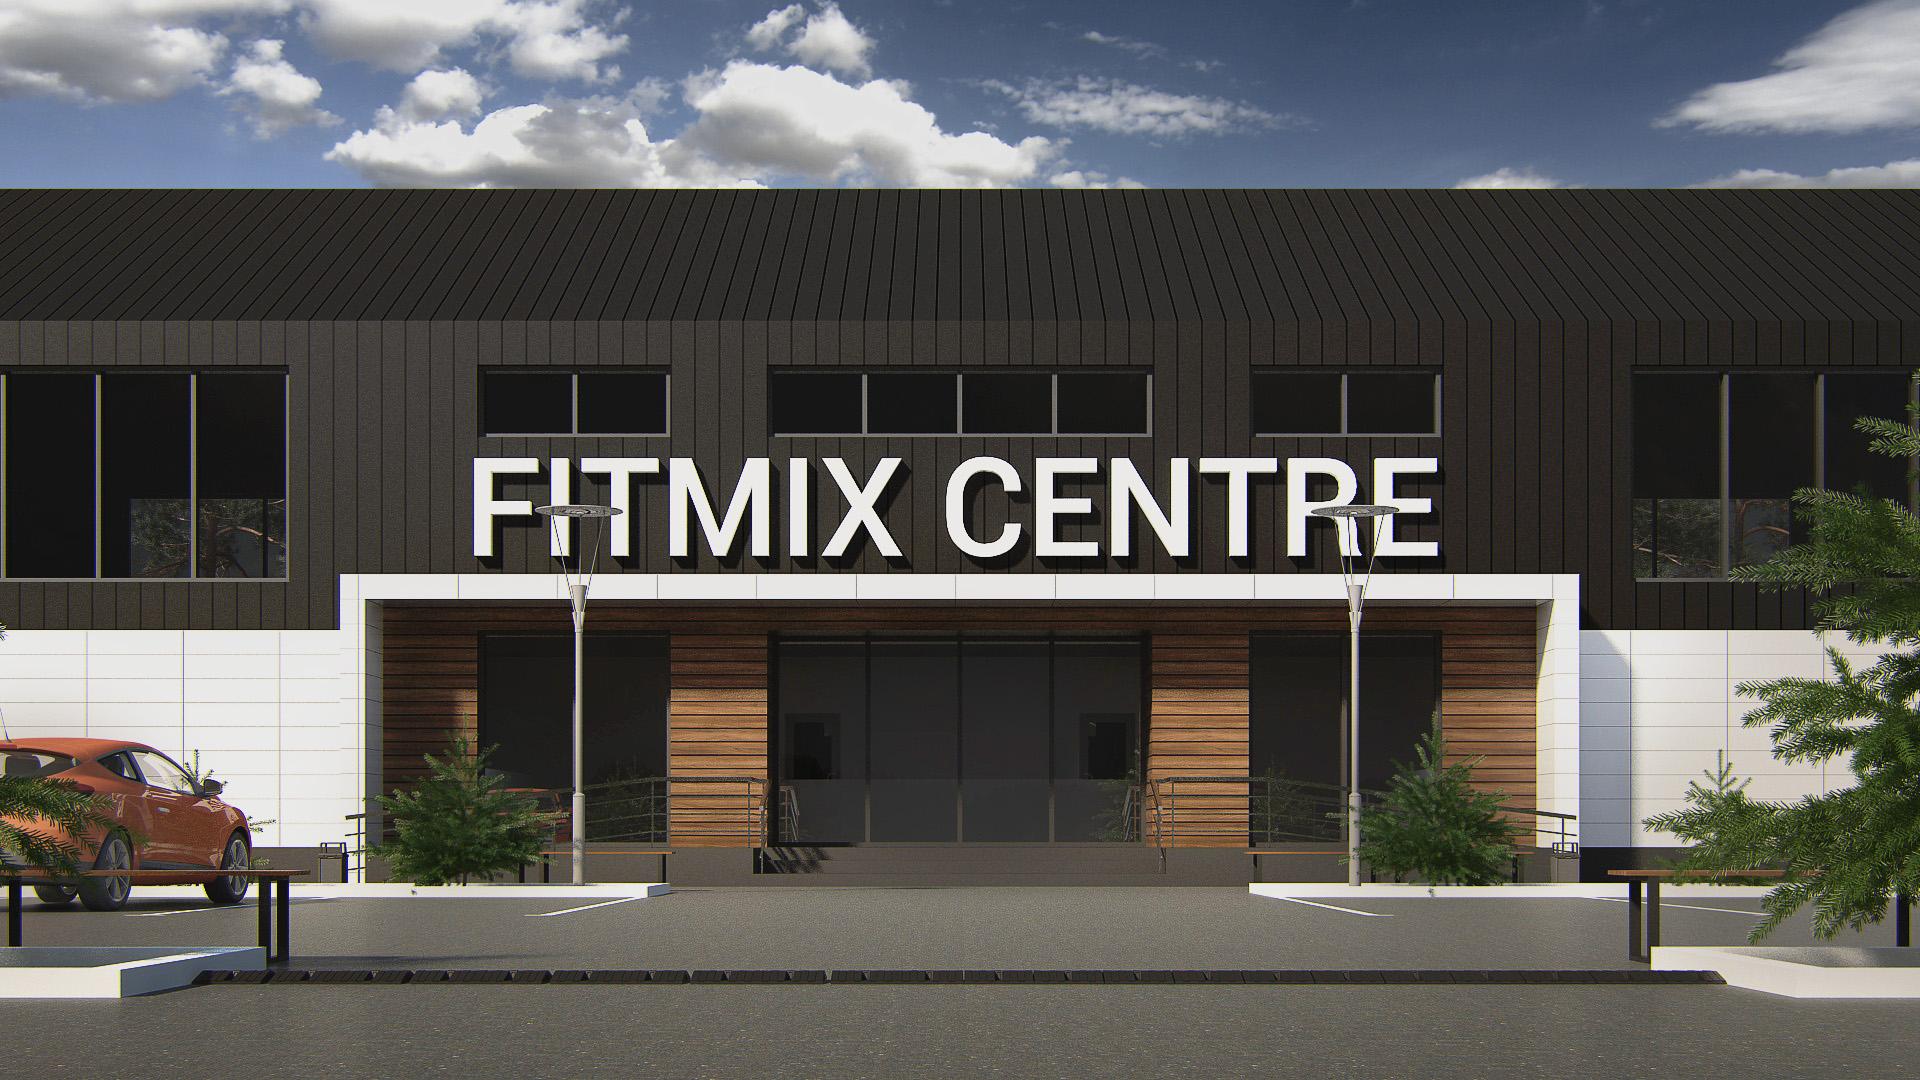 002-fitmixcentre